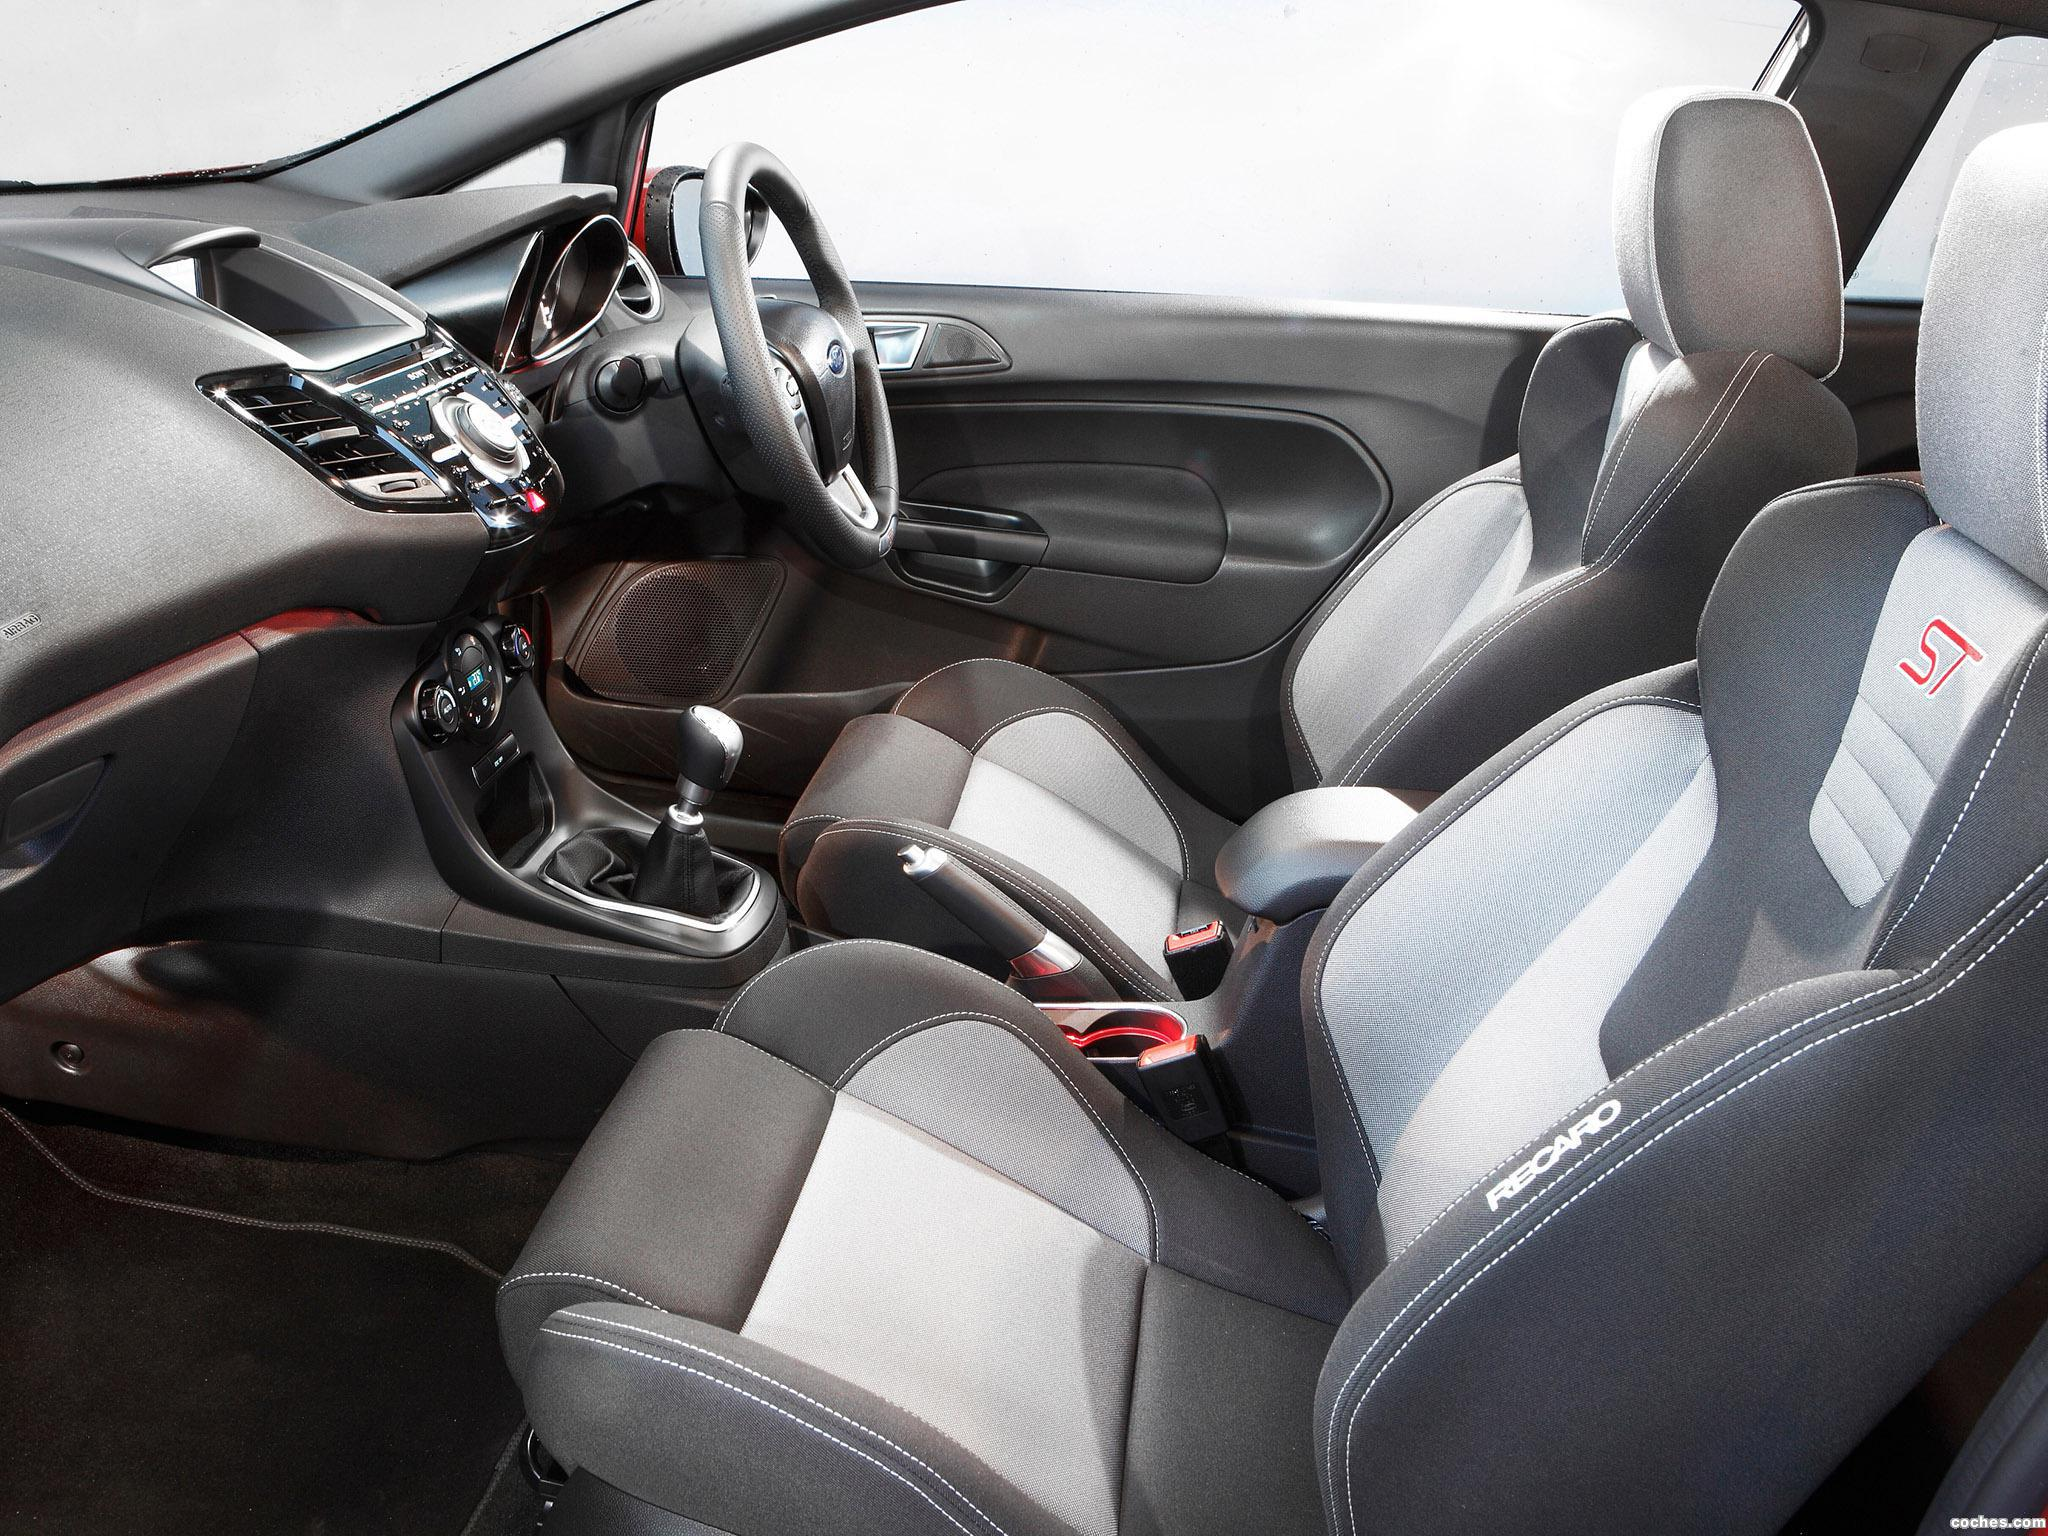 Foto 17 de Ford Fiesta ST 3 puertas Australia 2013